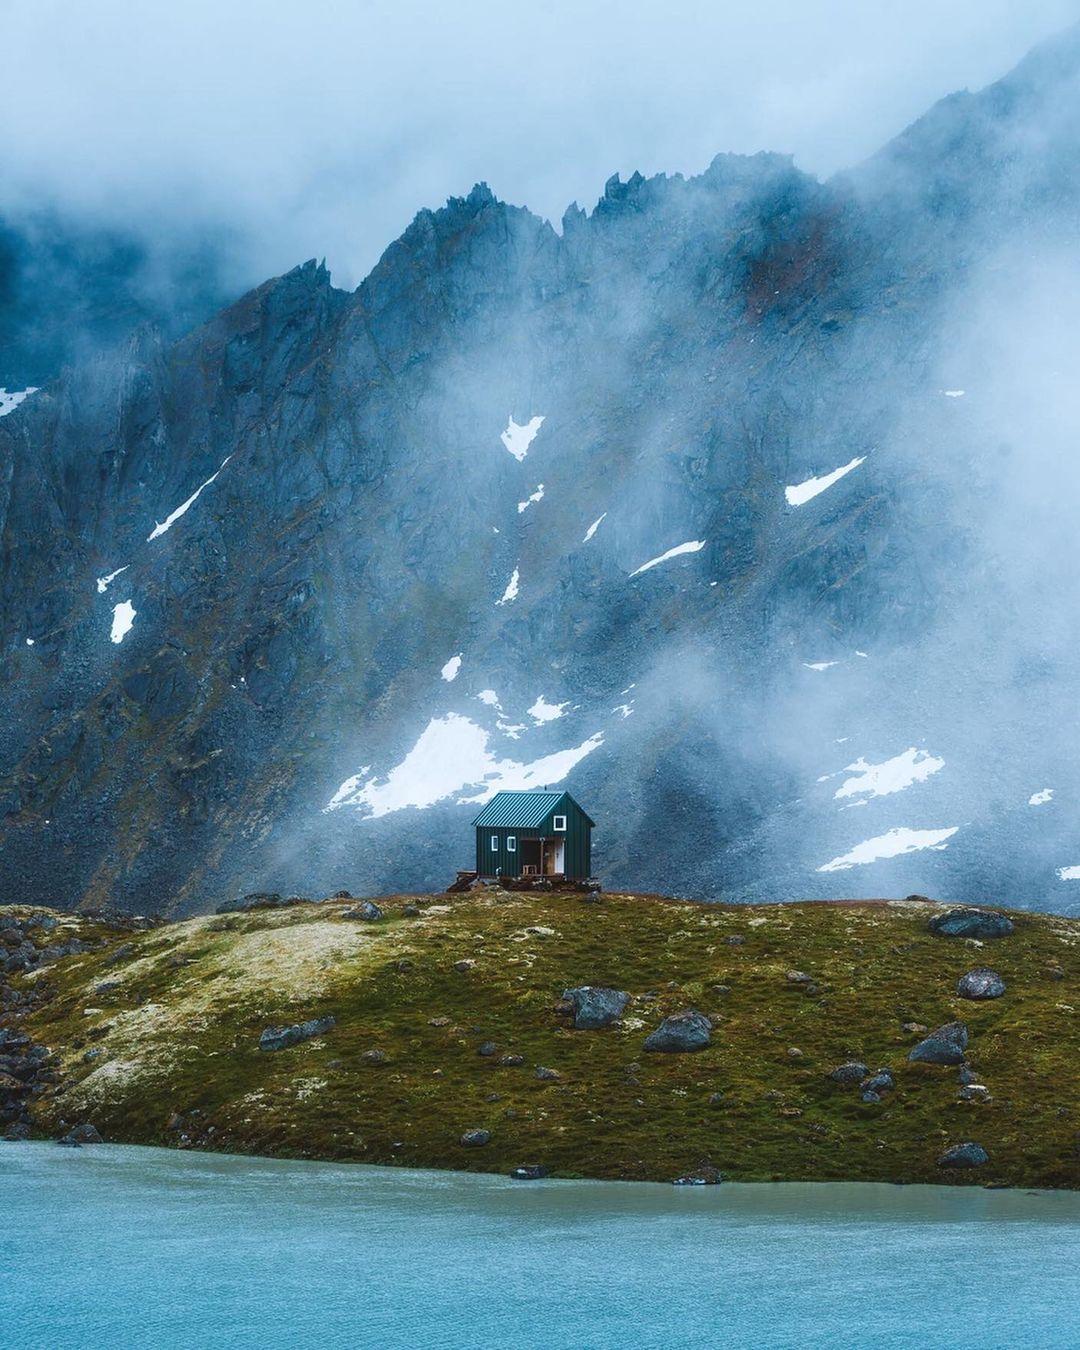 Природа и путешествия на снимках Люка Конаржевски